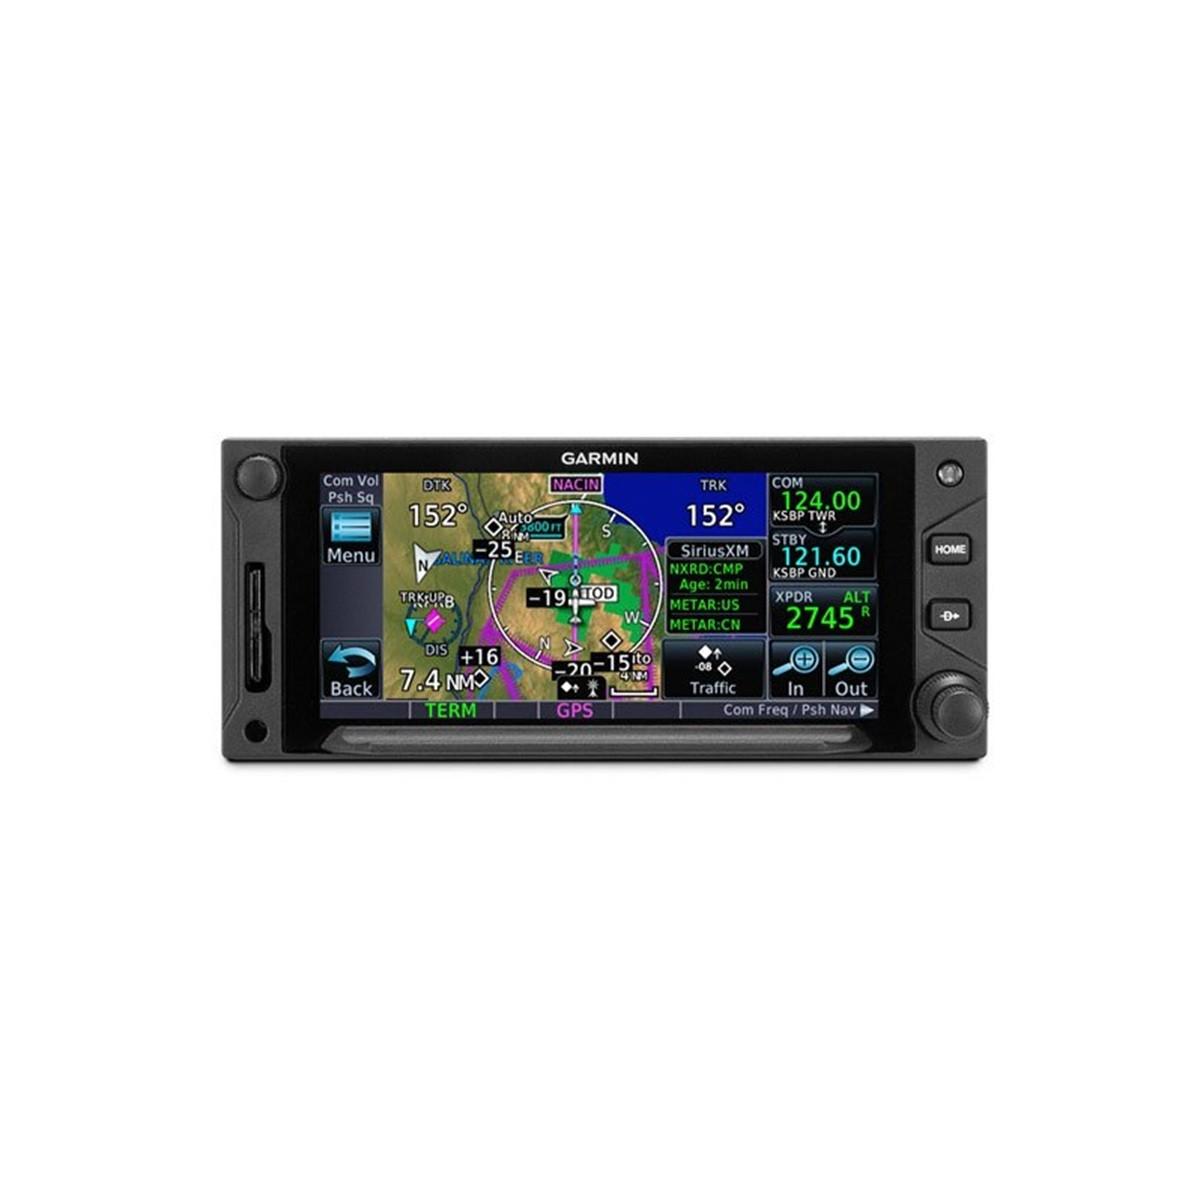 GARMIN GTN650Xi Sistema GPS/NAV/COM Touchscreen